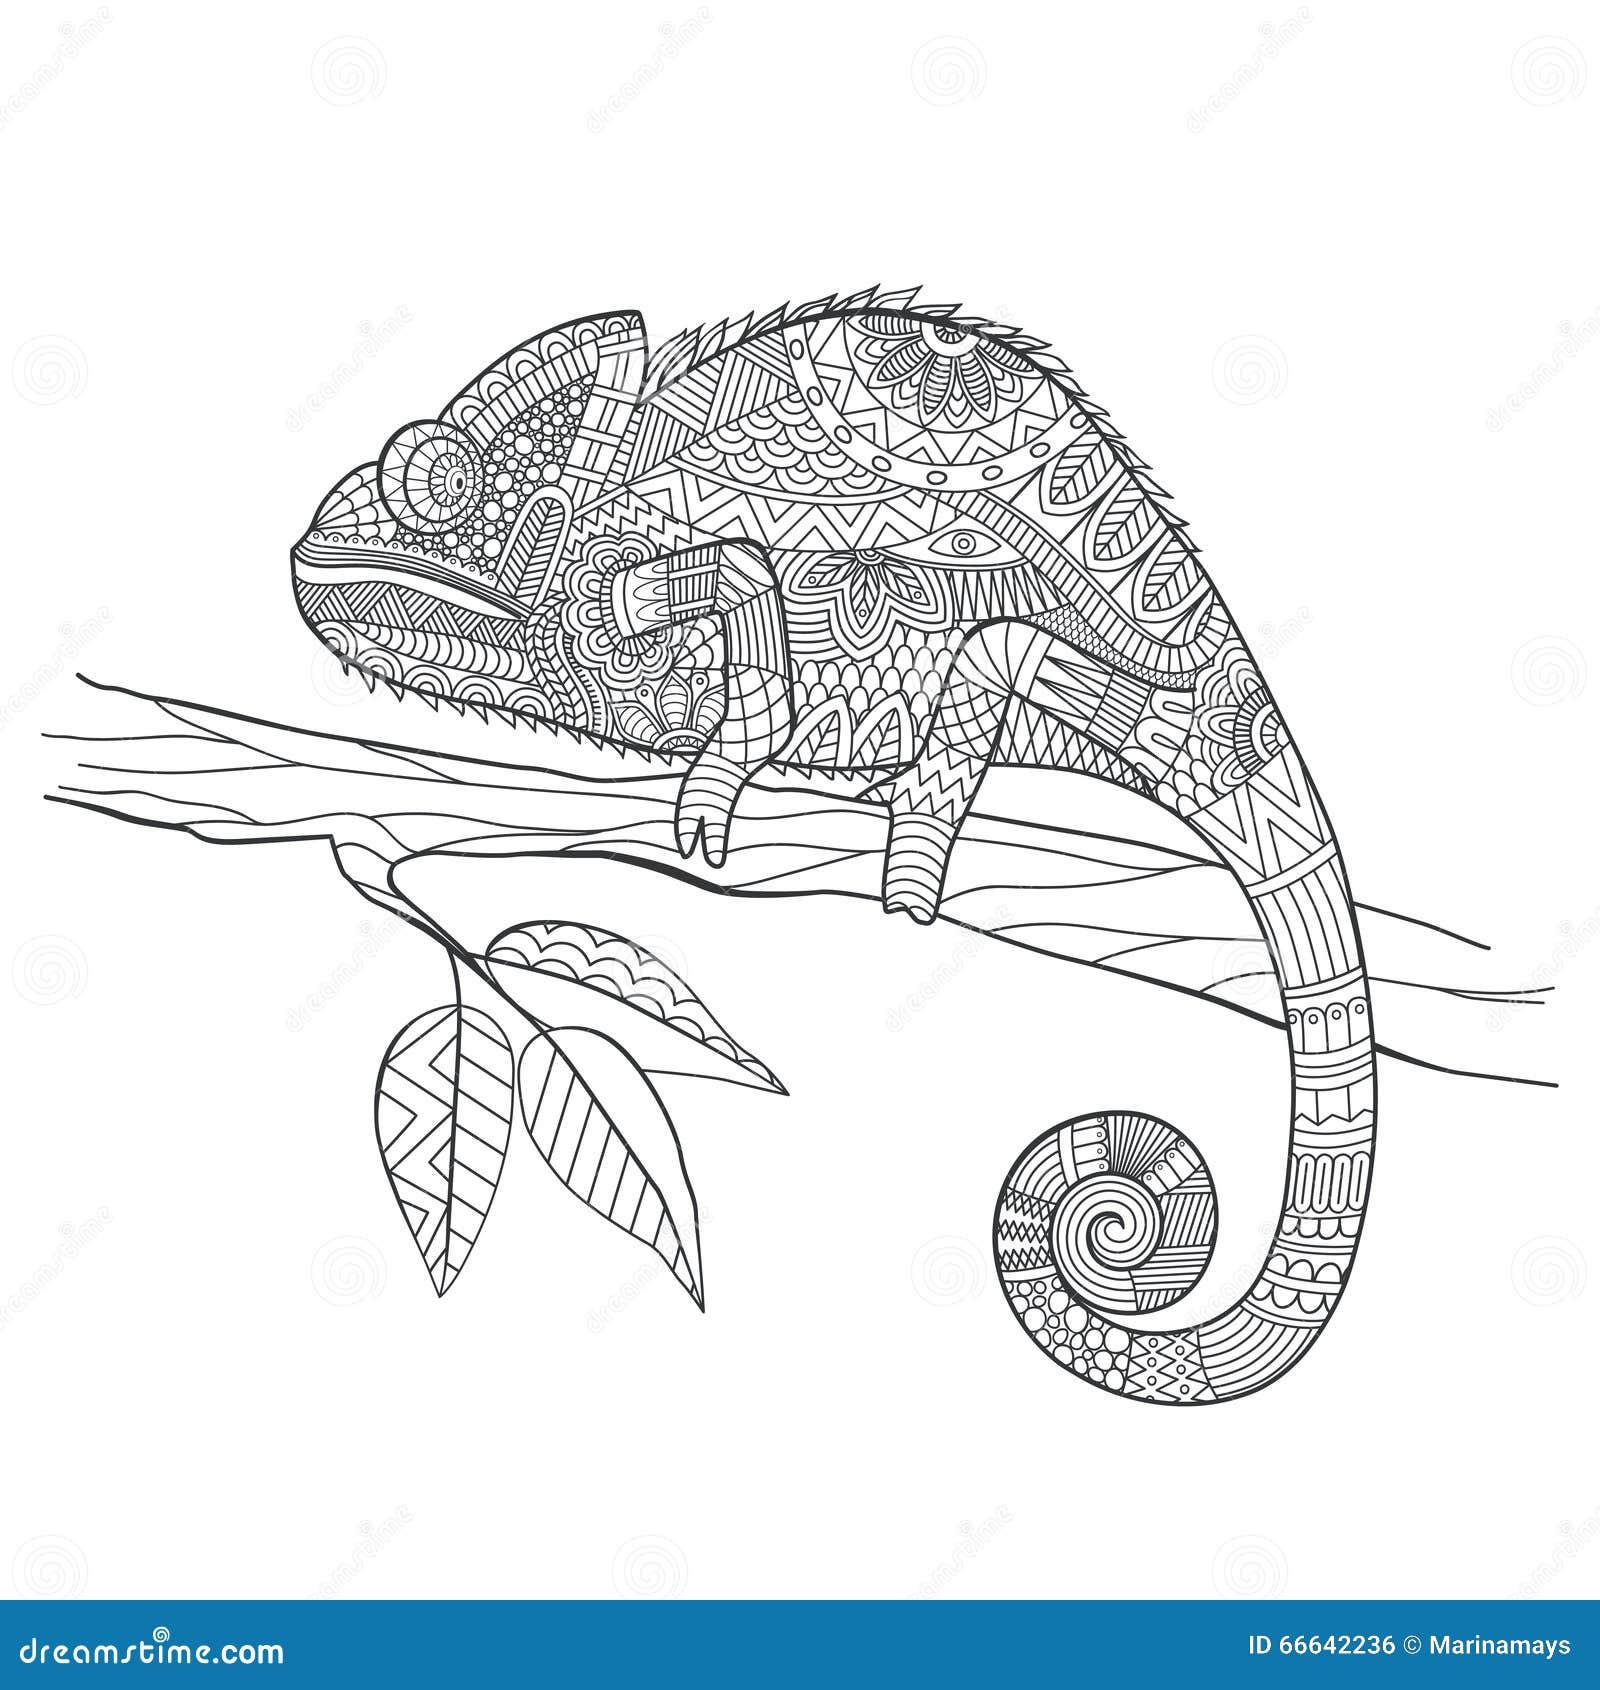 Zentangle Stylized Chameleon Lizard Hand Drawn Vector